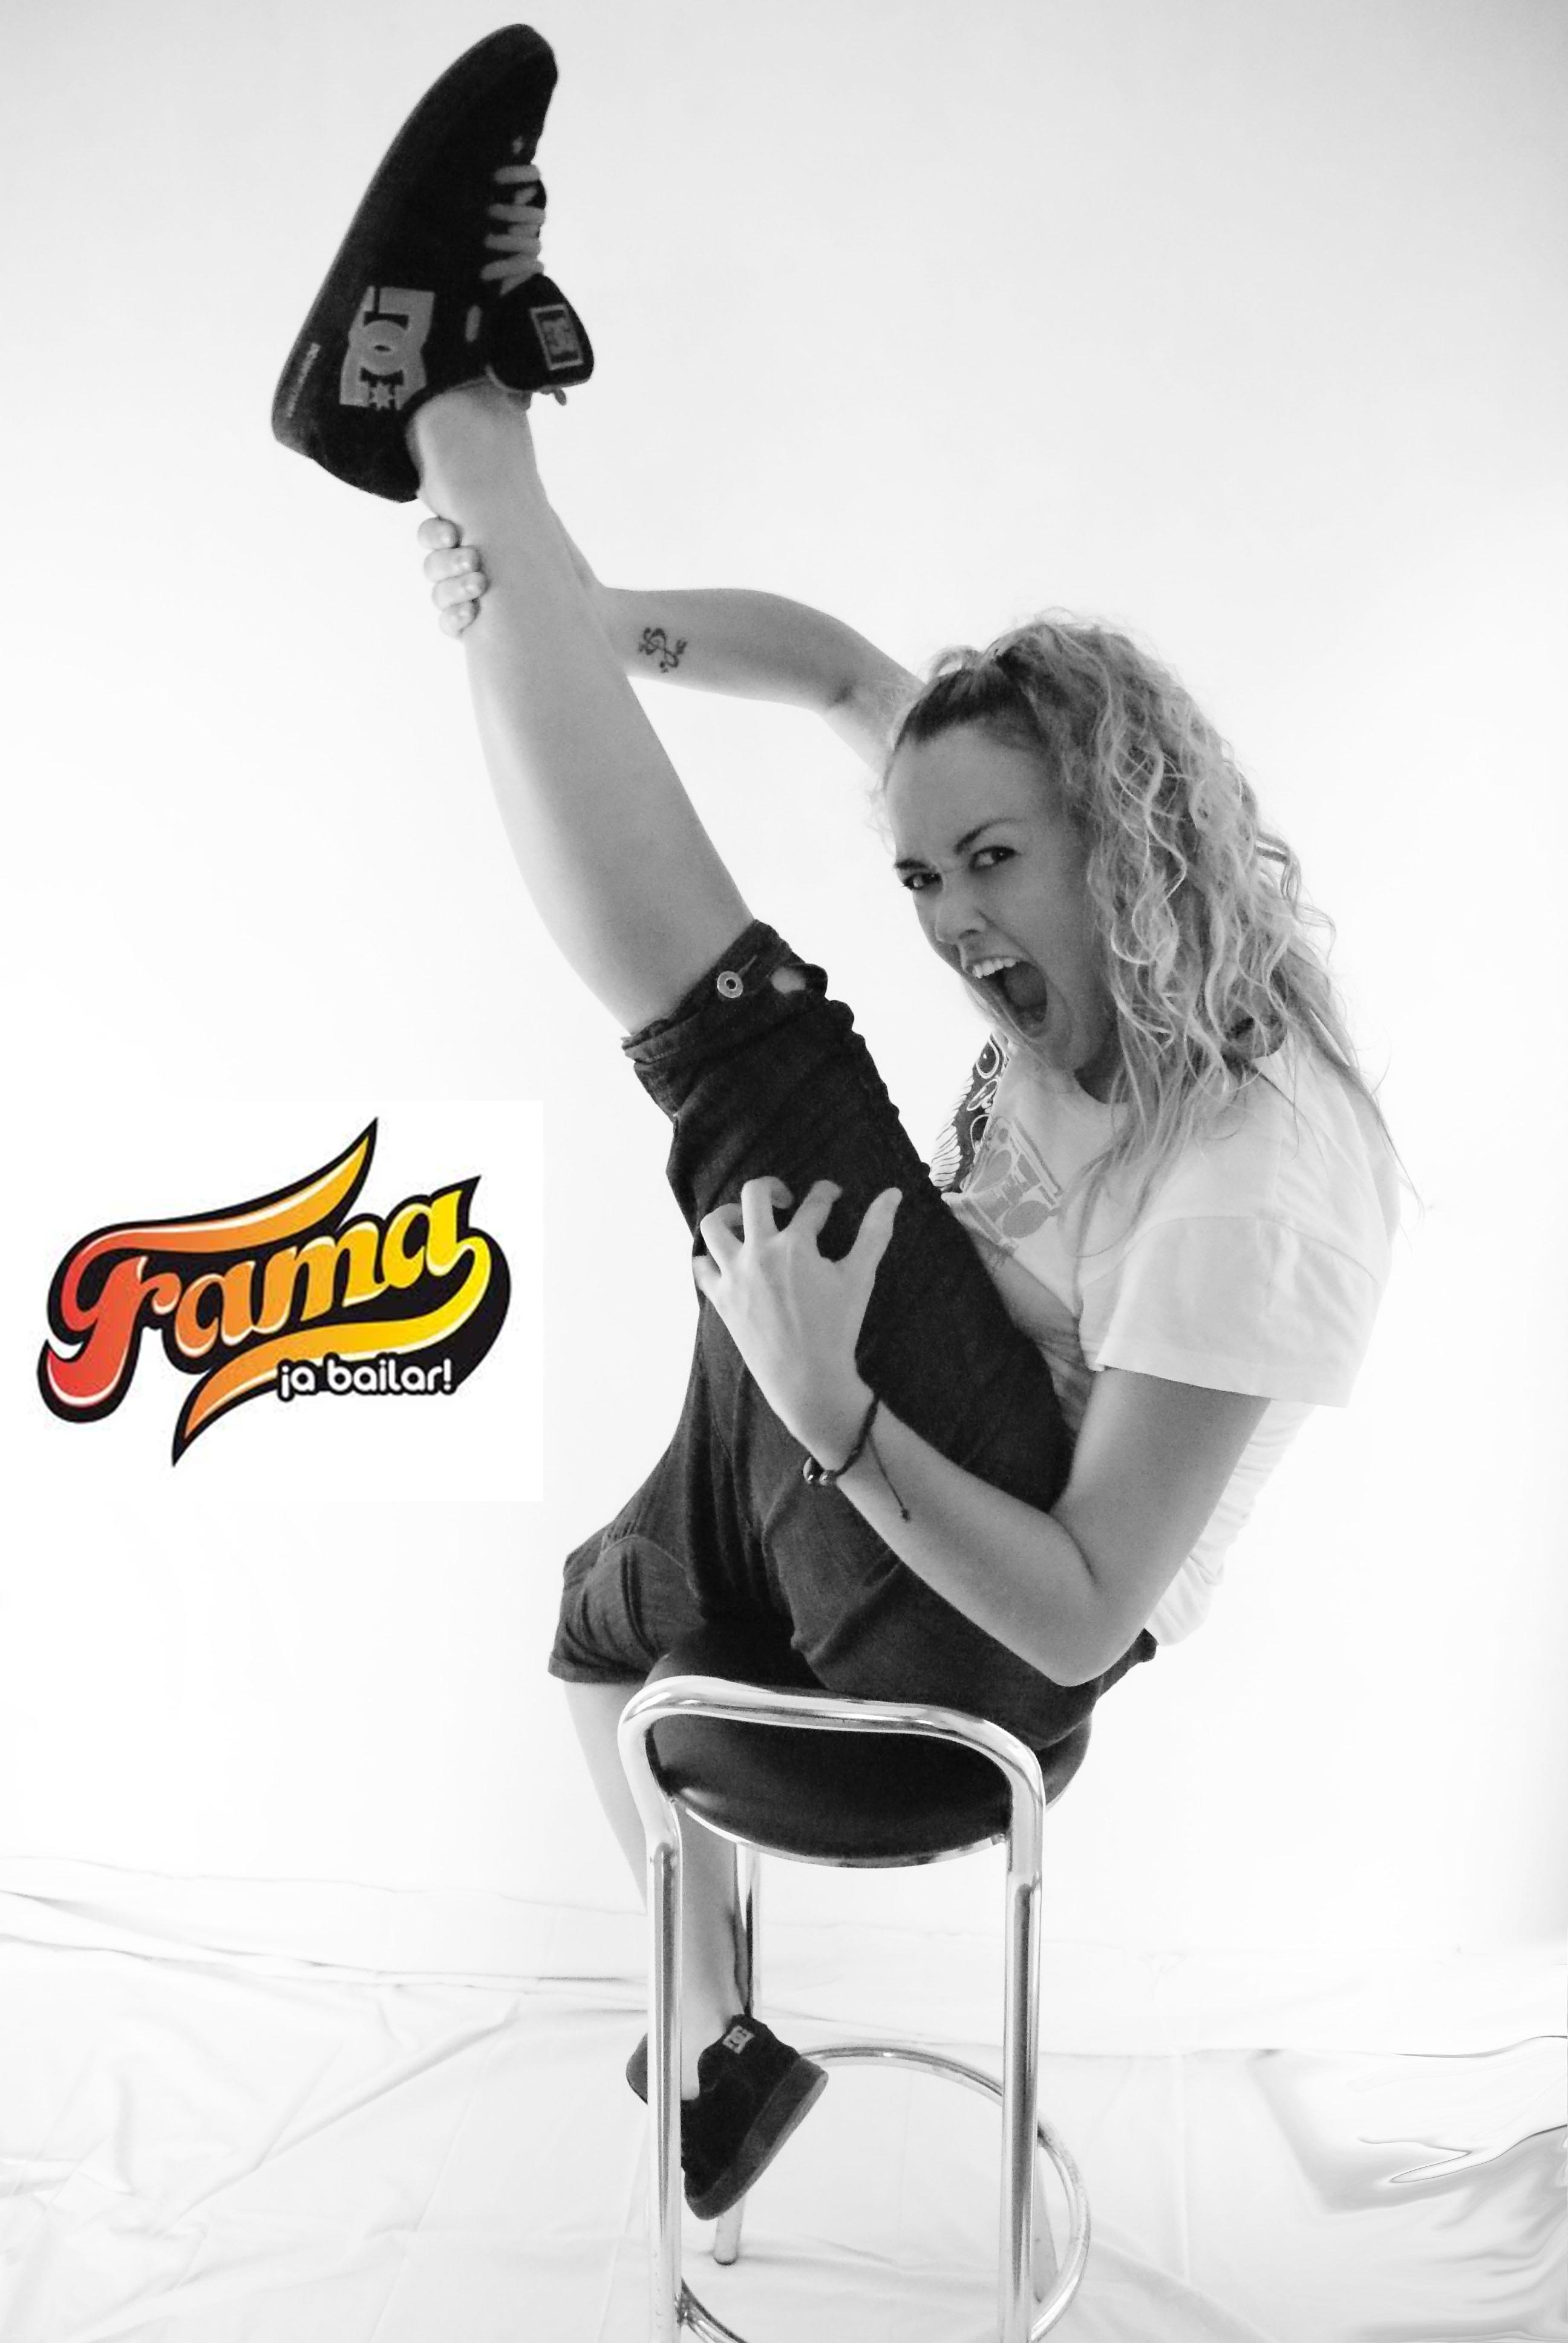 Baile y funky infantil a partir de septiembre en el local de AVIB